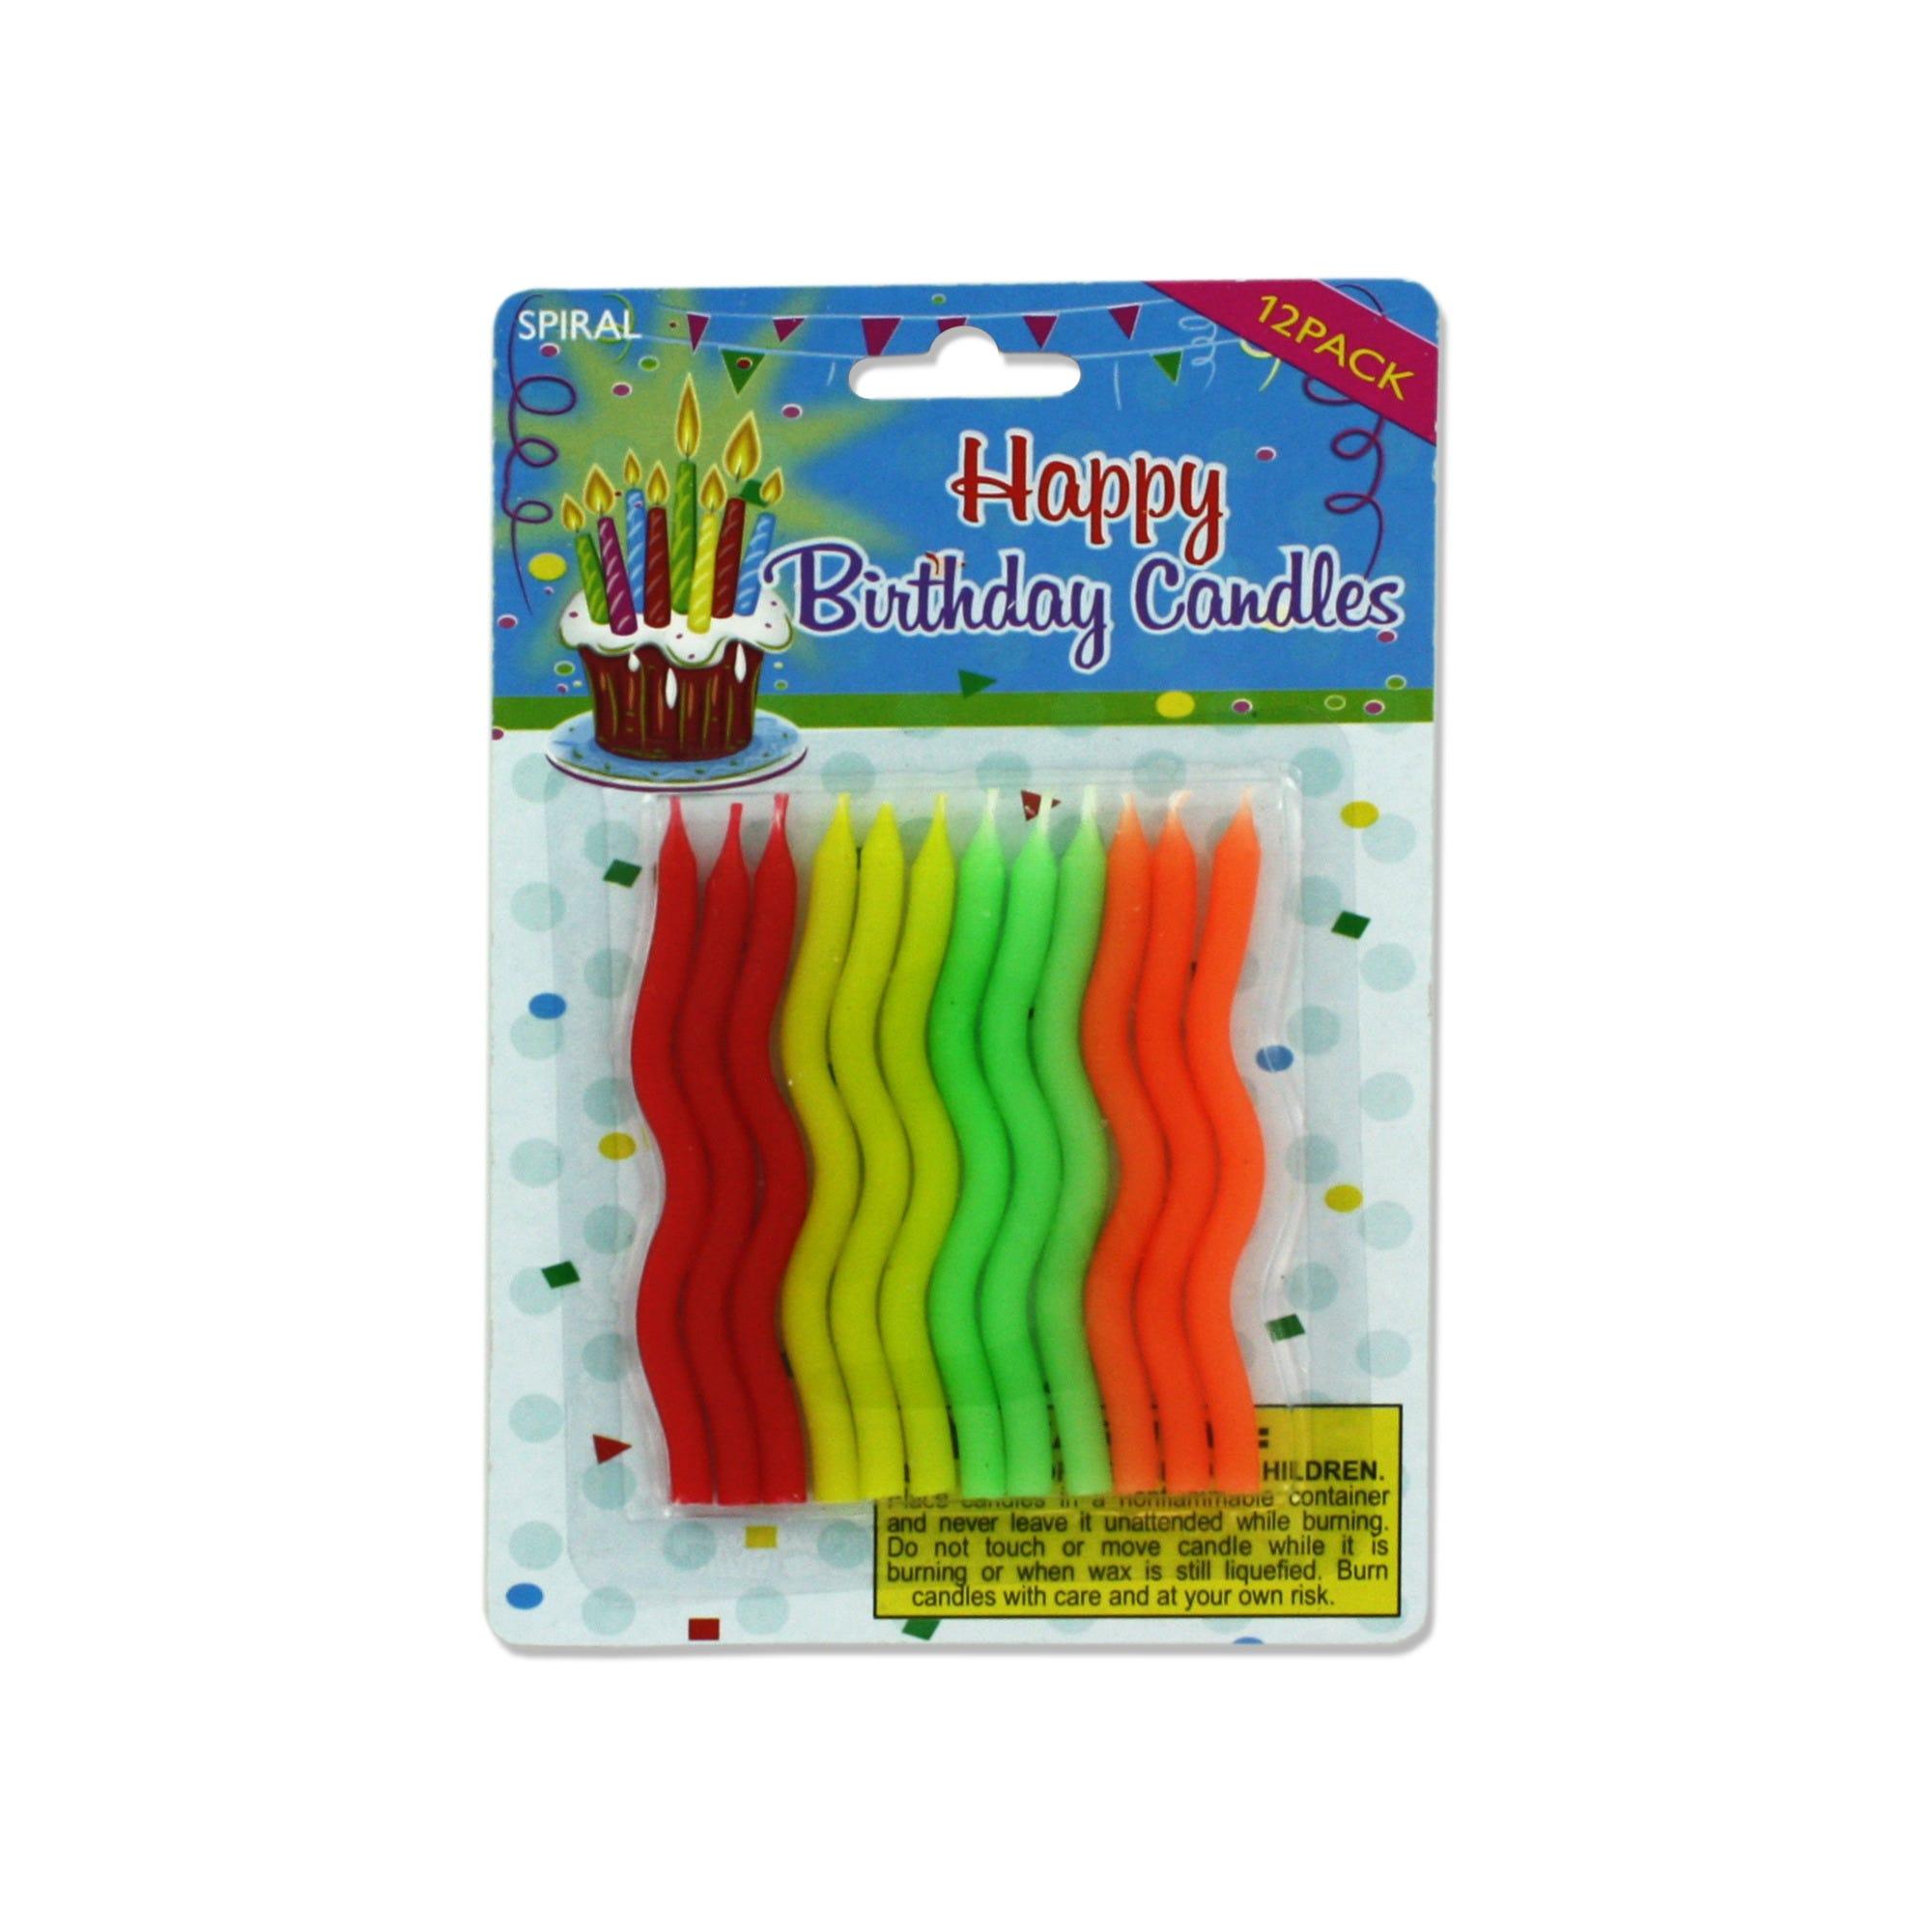 Spiral Birthday CANDLEs- Qty 24